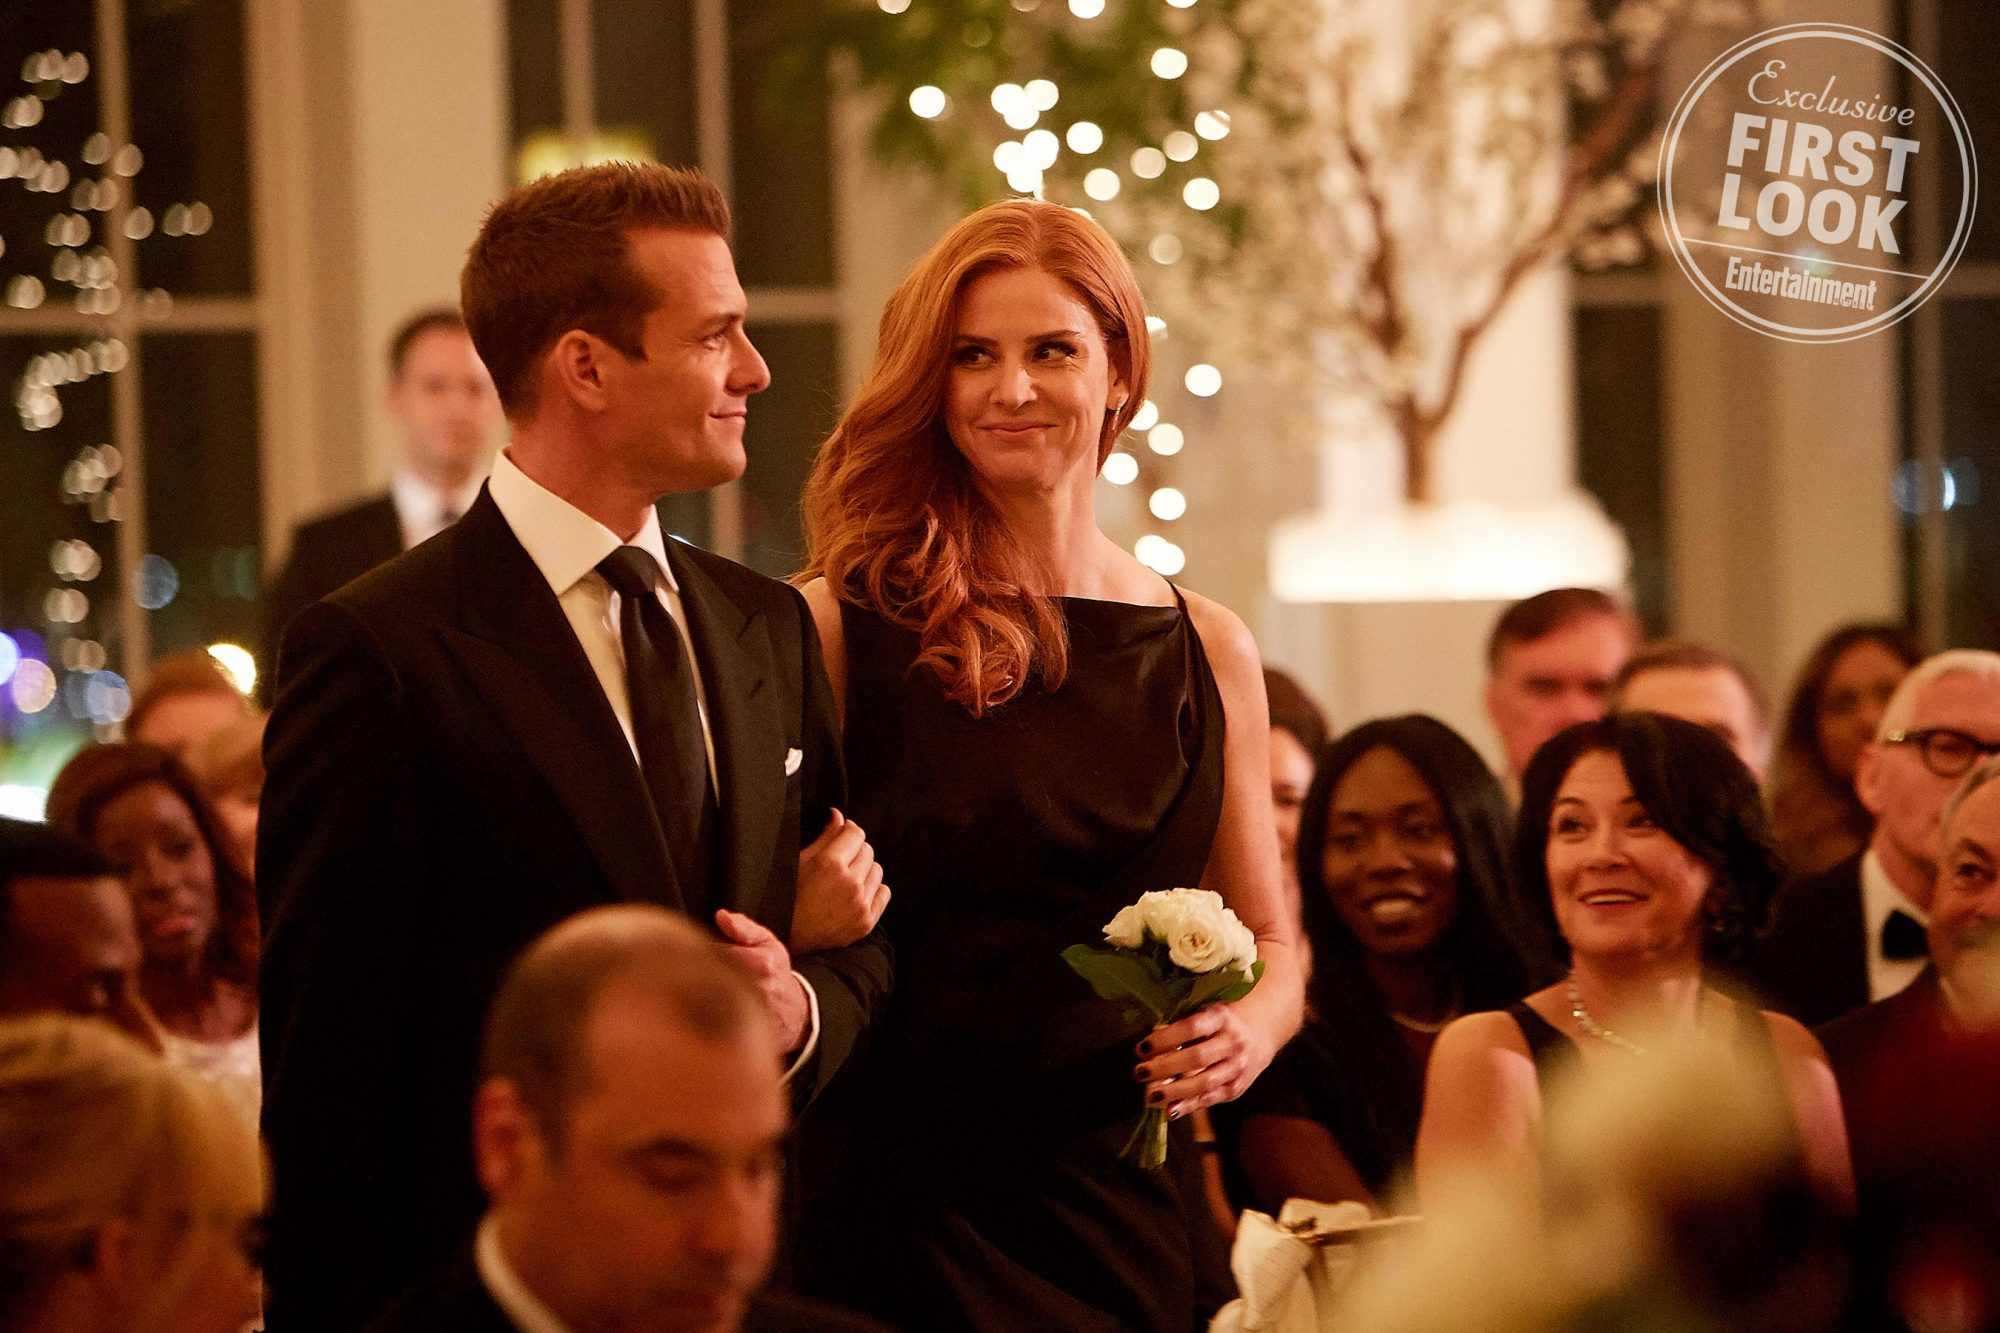 suits wedding meghan markle patrick j adams season 7 finale first look ew com suits wedding meghan markle patrick j